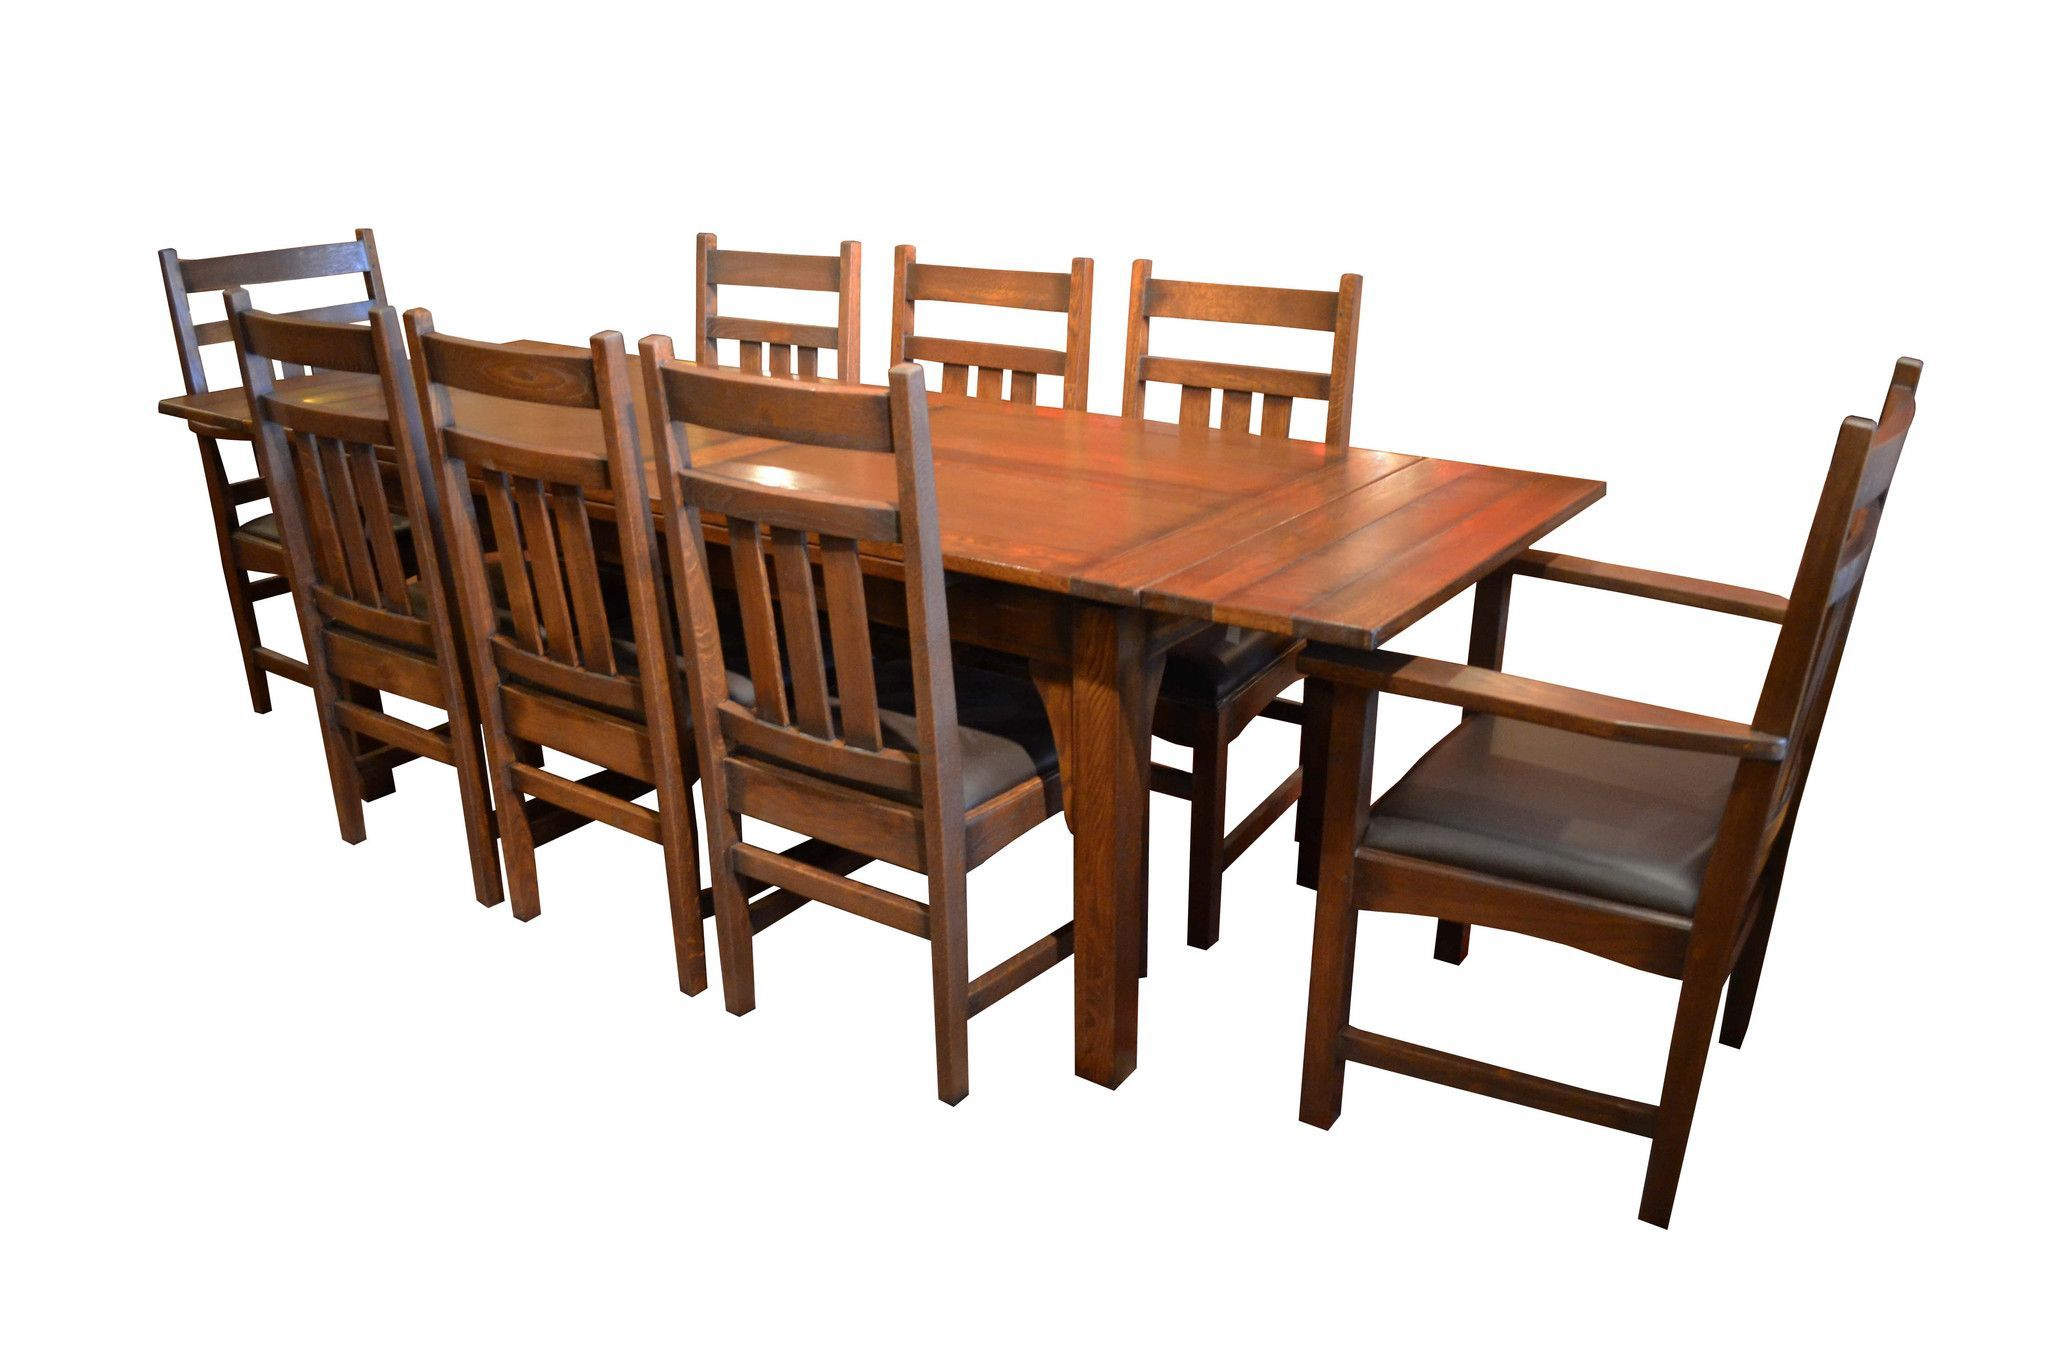 Craftsman Dining Room Table, Craftsman Dining Room Set